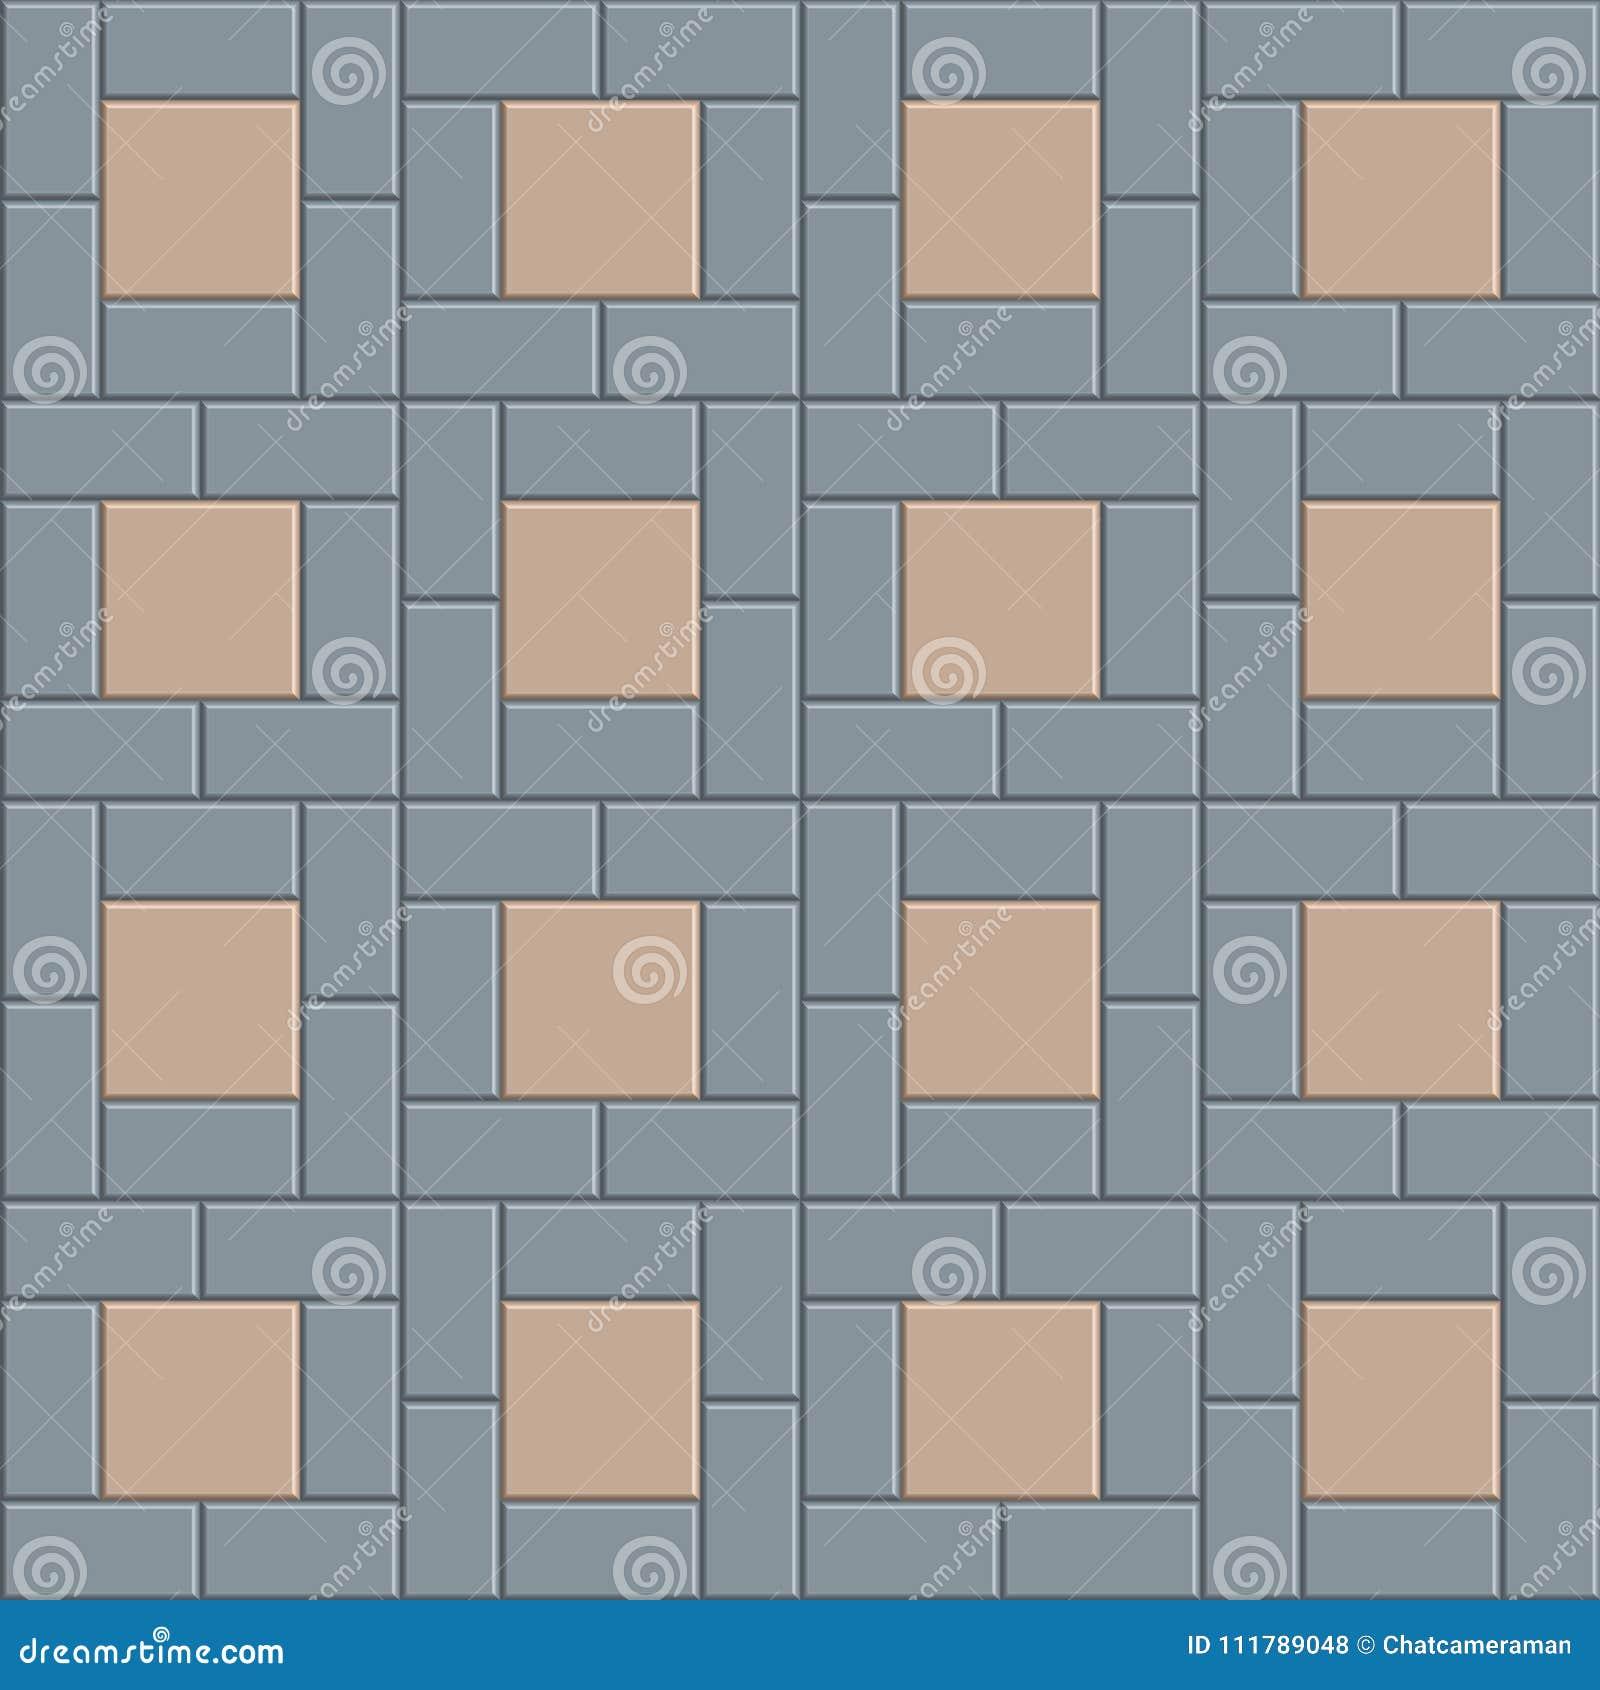 3D pavement tile floor stock vector. Illustration of footpath ...